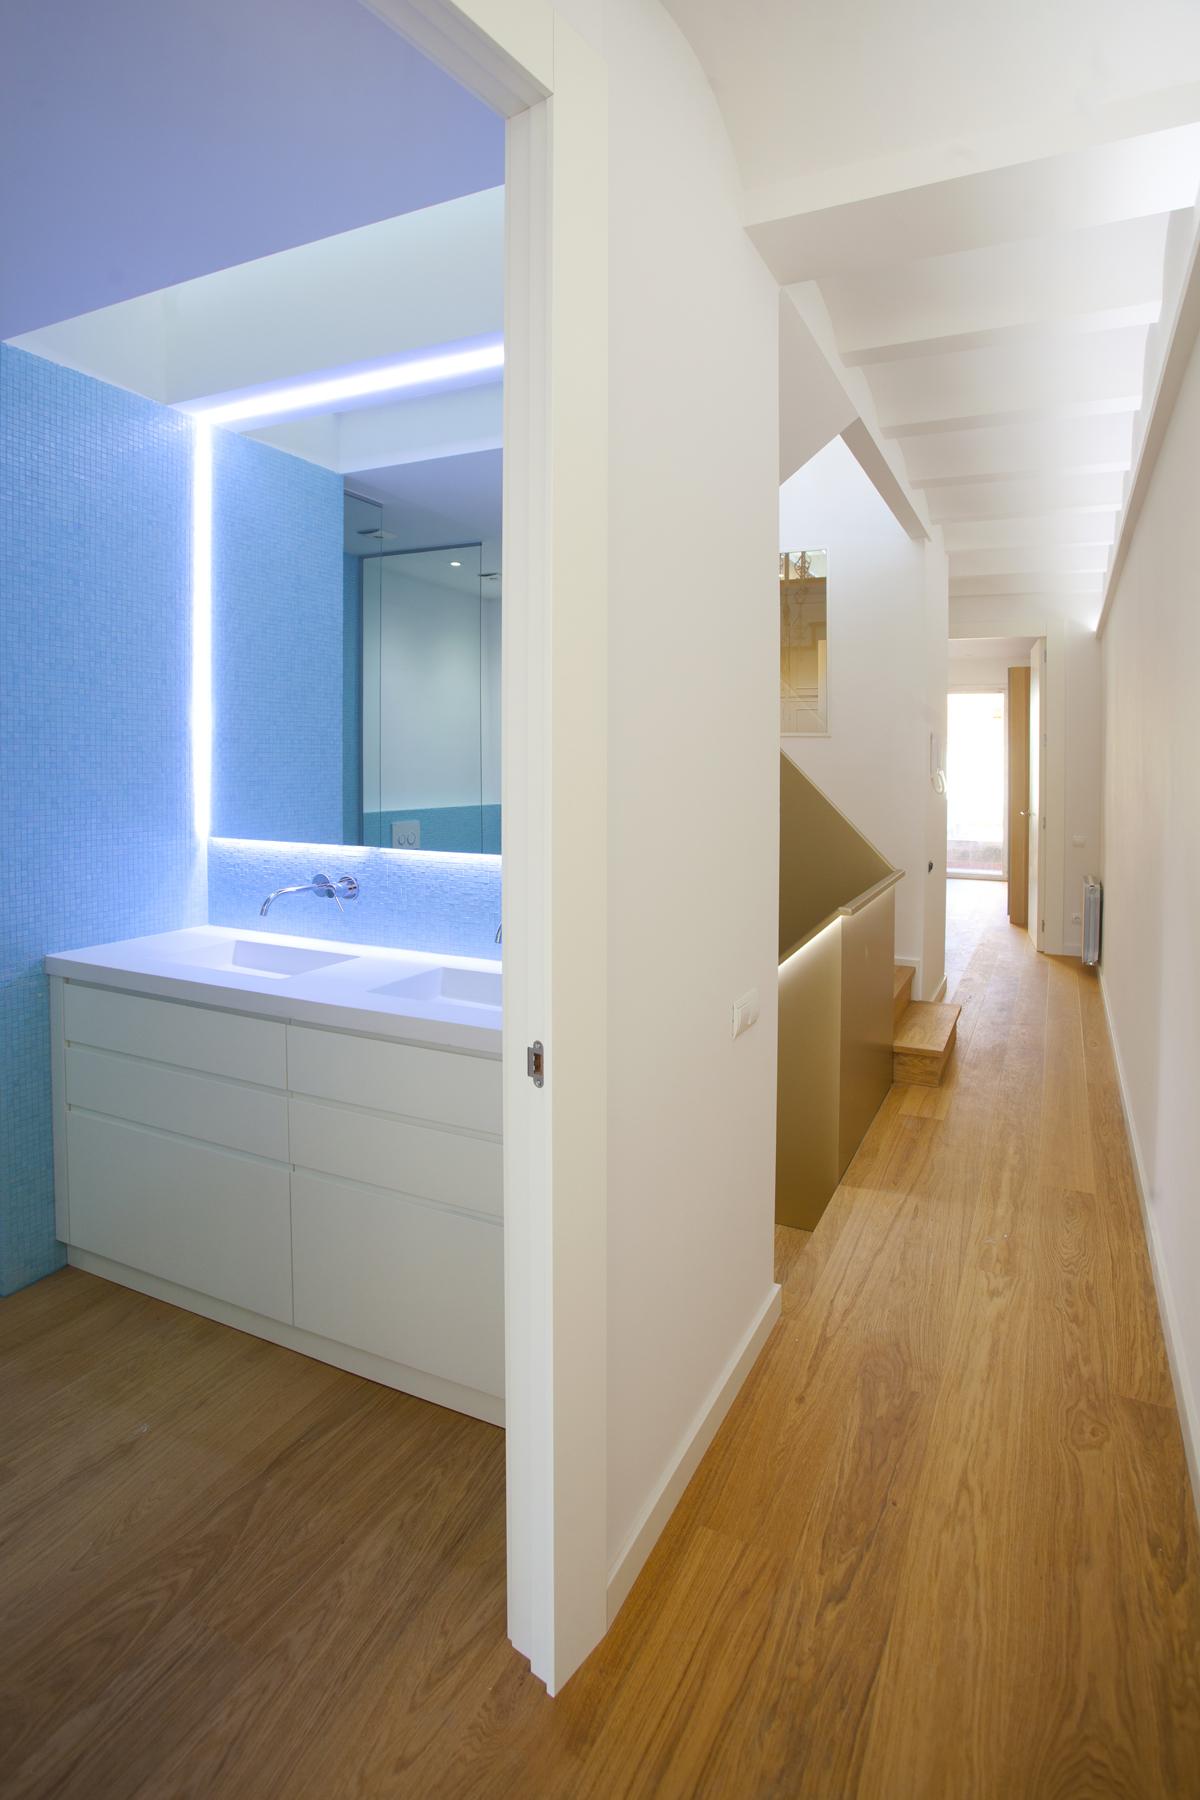 roa-arquitectura-sostenibilidad-residencial-rehabilitacion 05